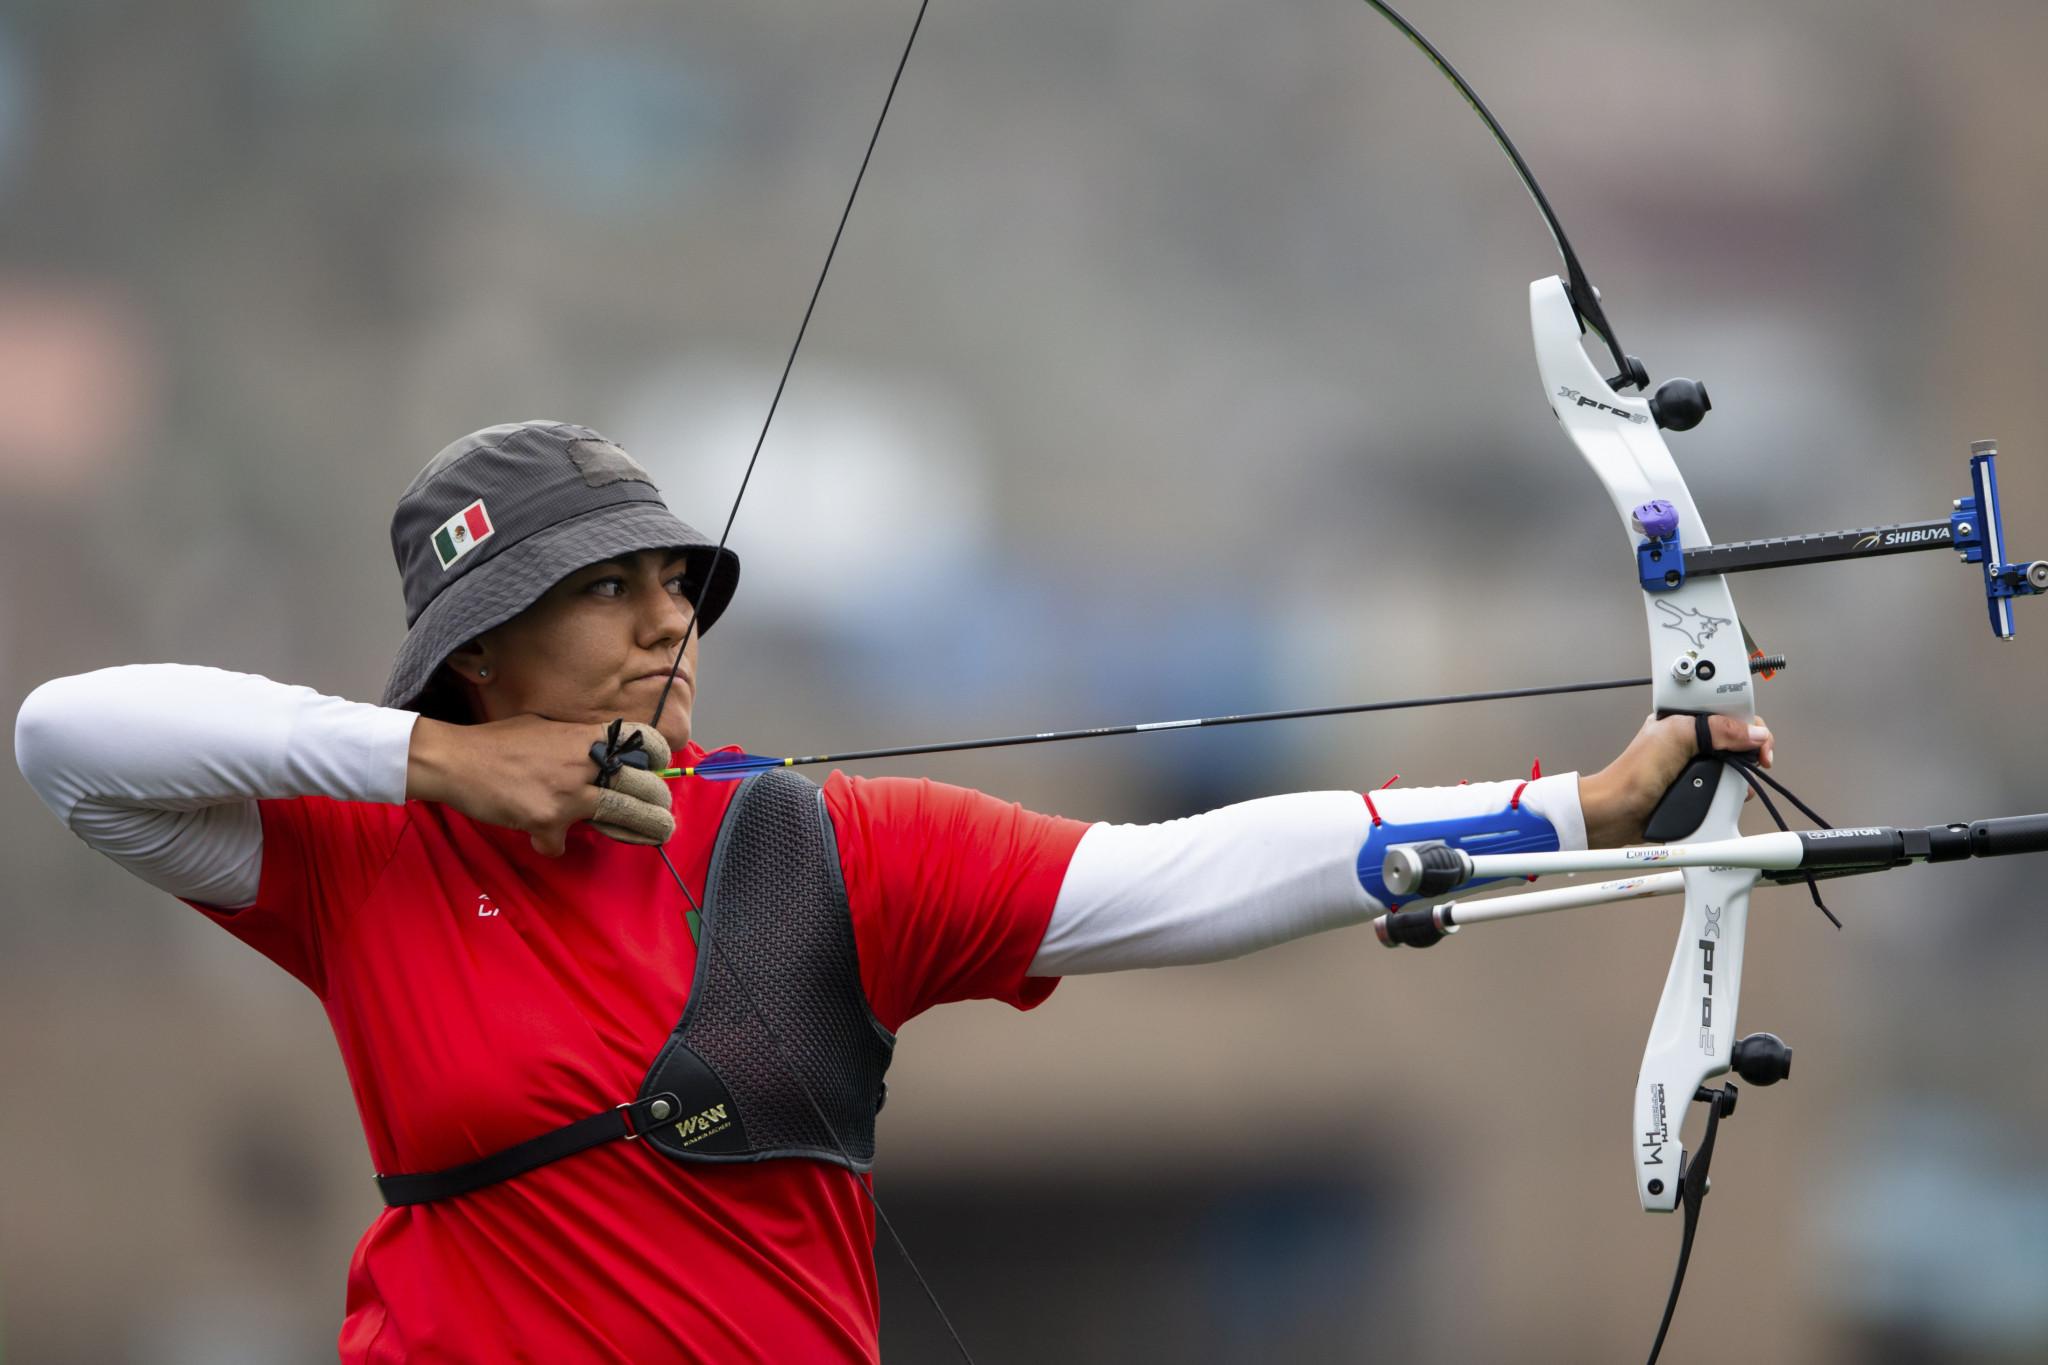 Mexico's Alejandra Valencia Trujilo won the women's individual recurve event ©Lima 2019